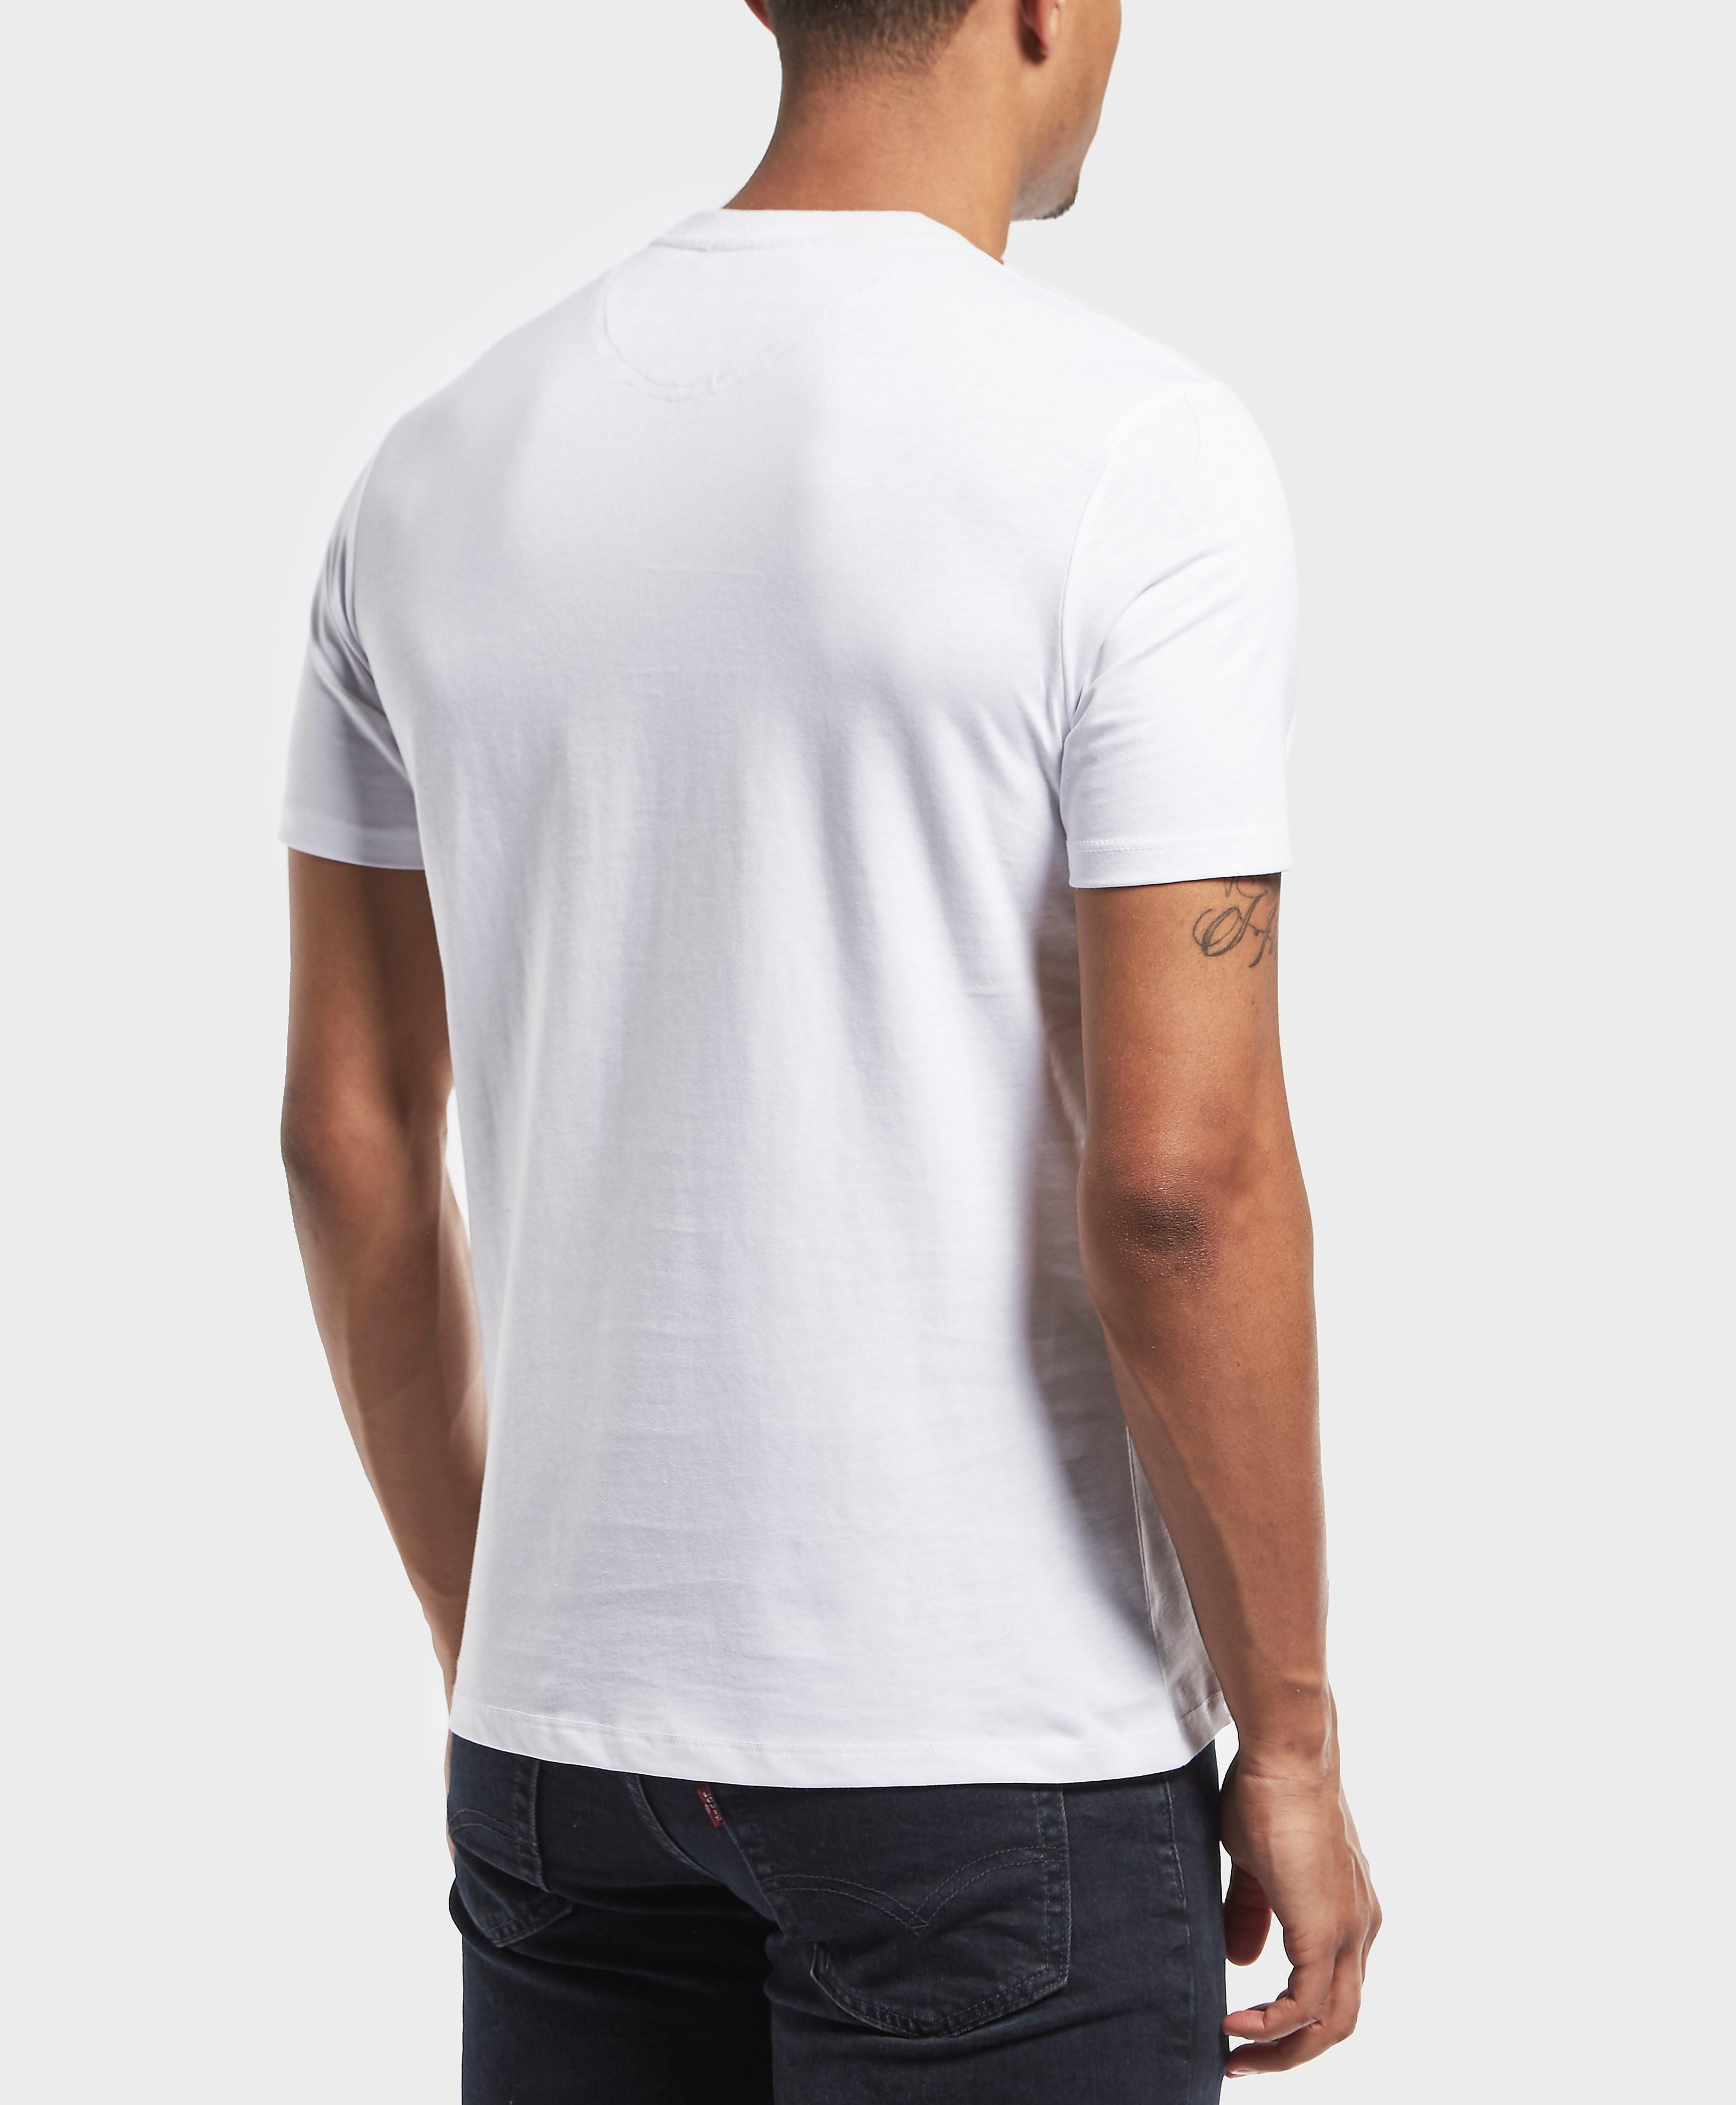 Aquascutum Aldis Crest Short Sleeve T-Shirt